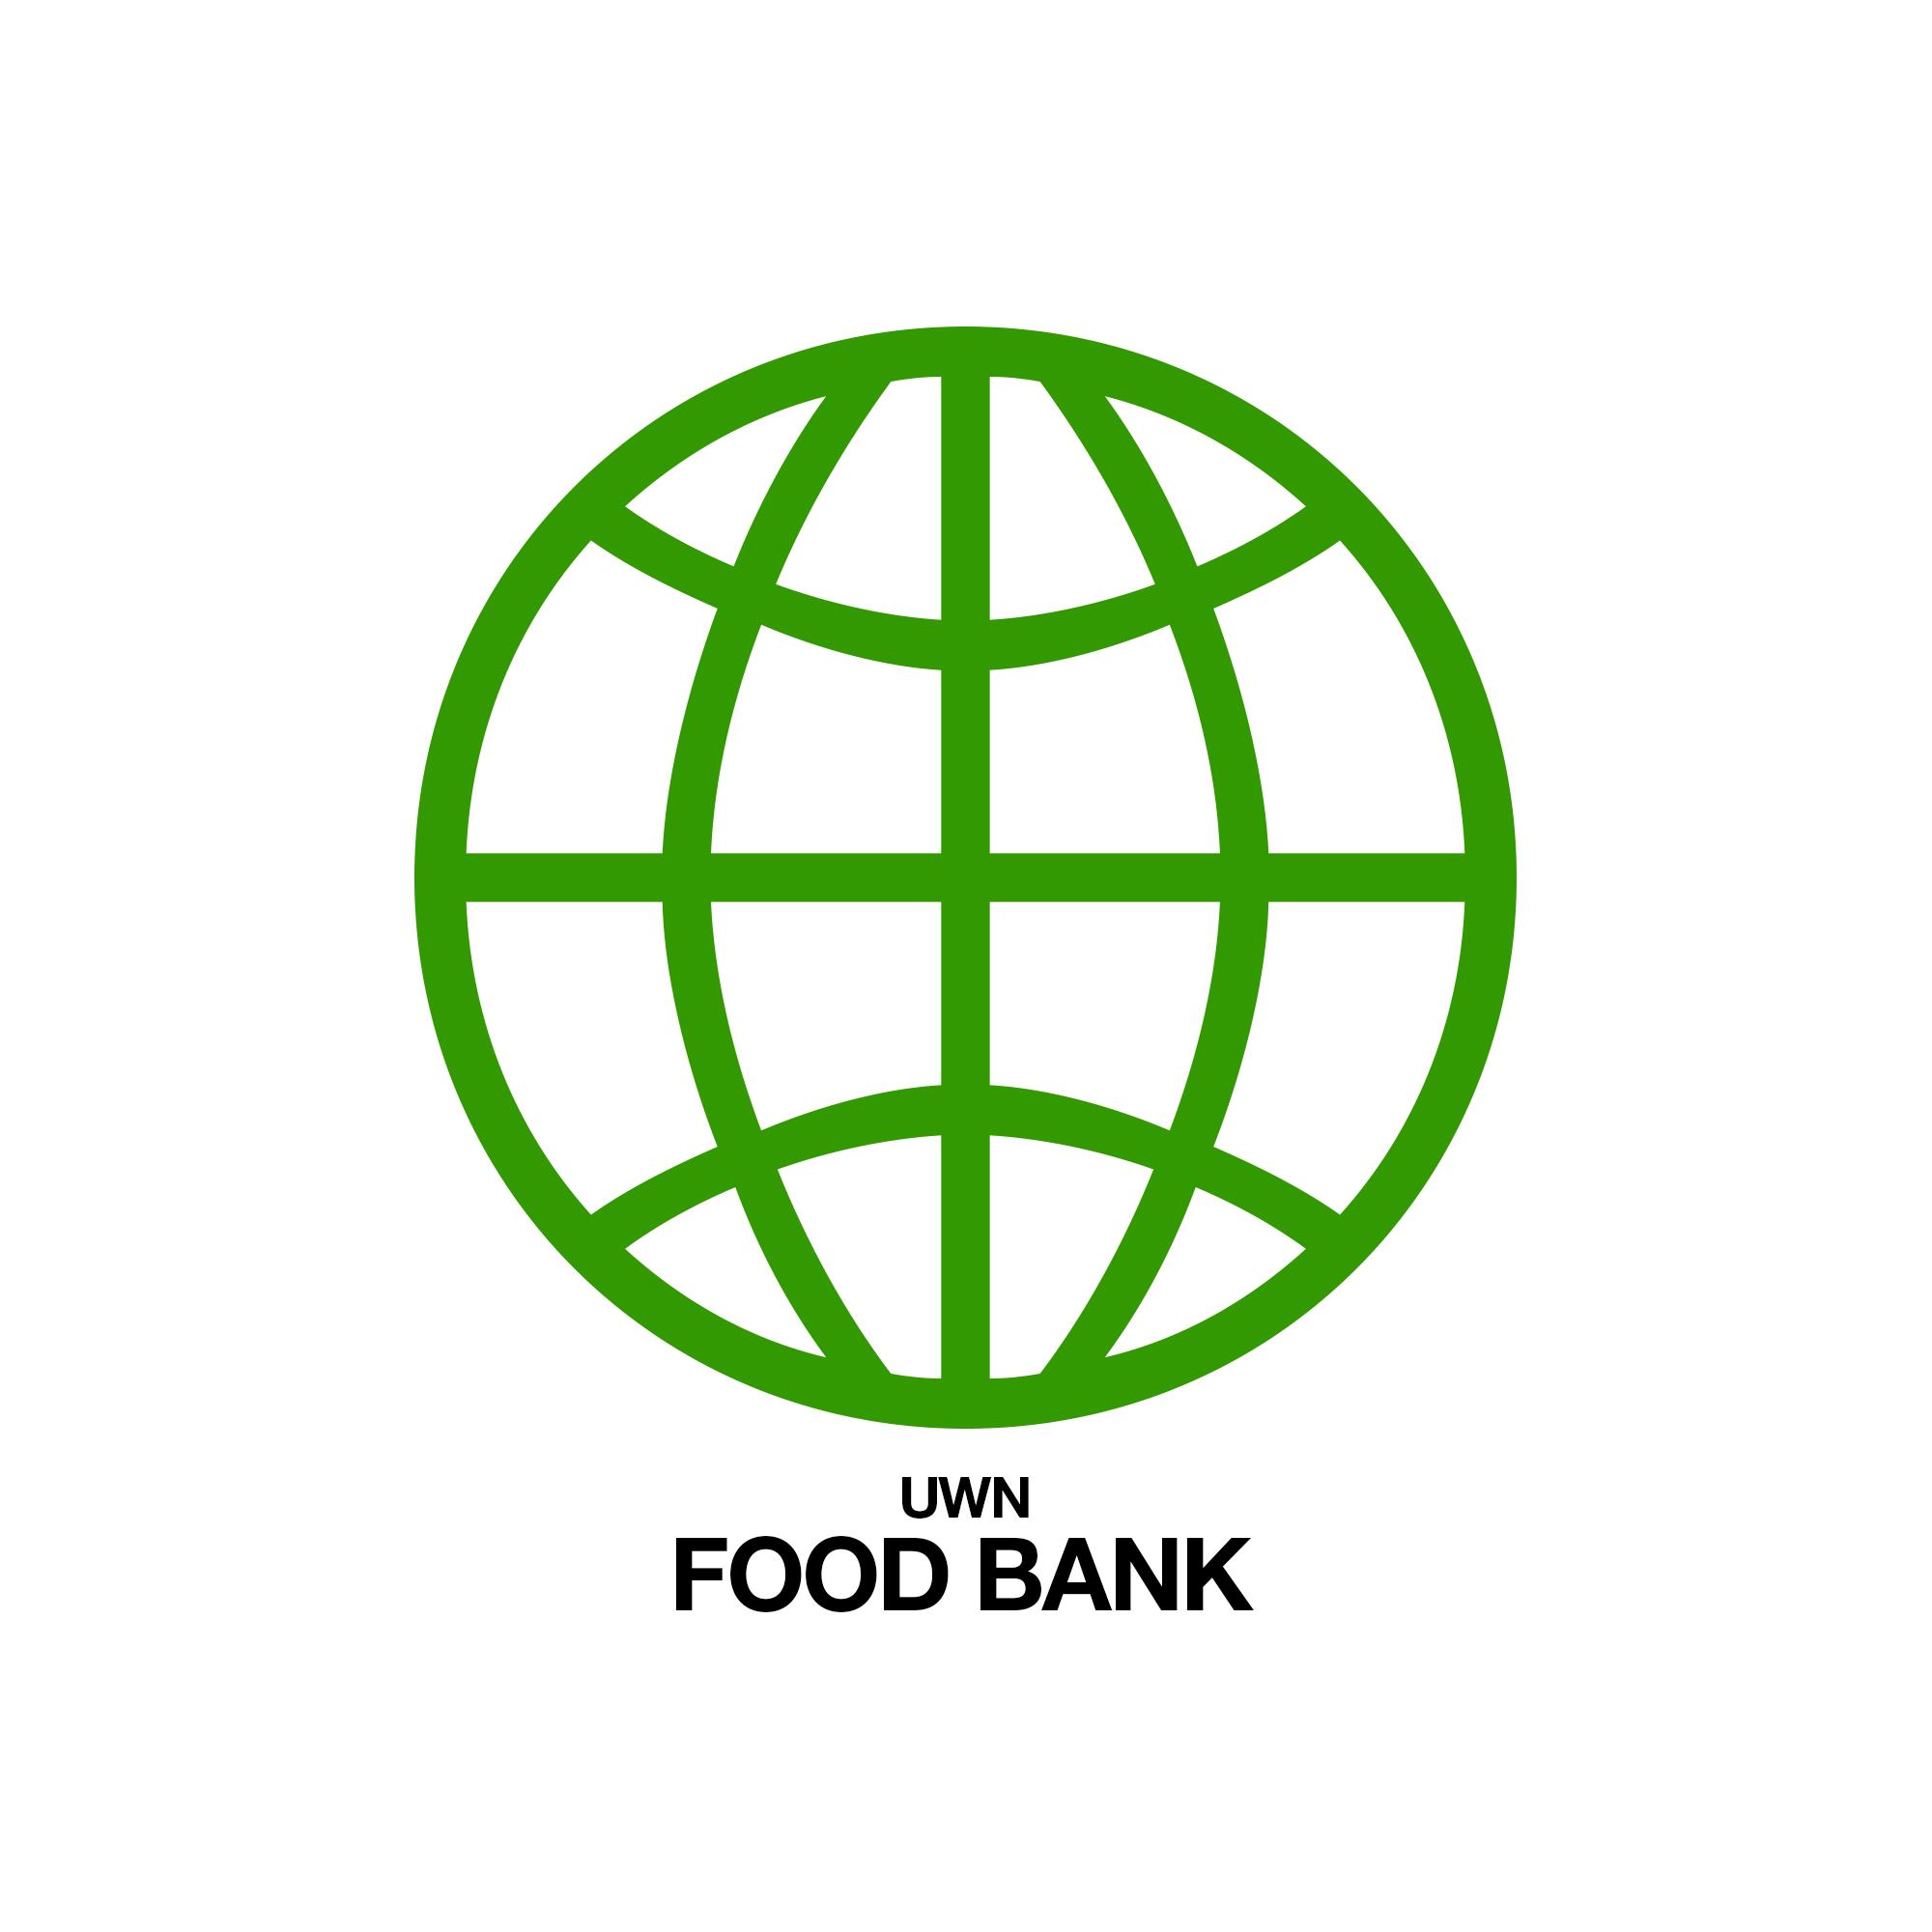 UWN Food Bank